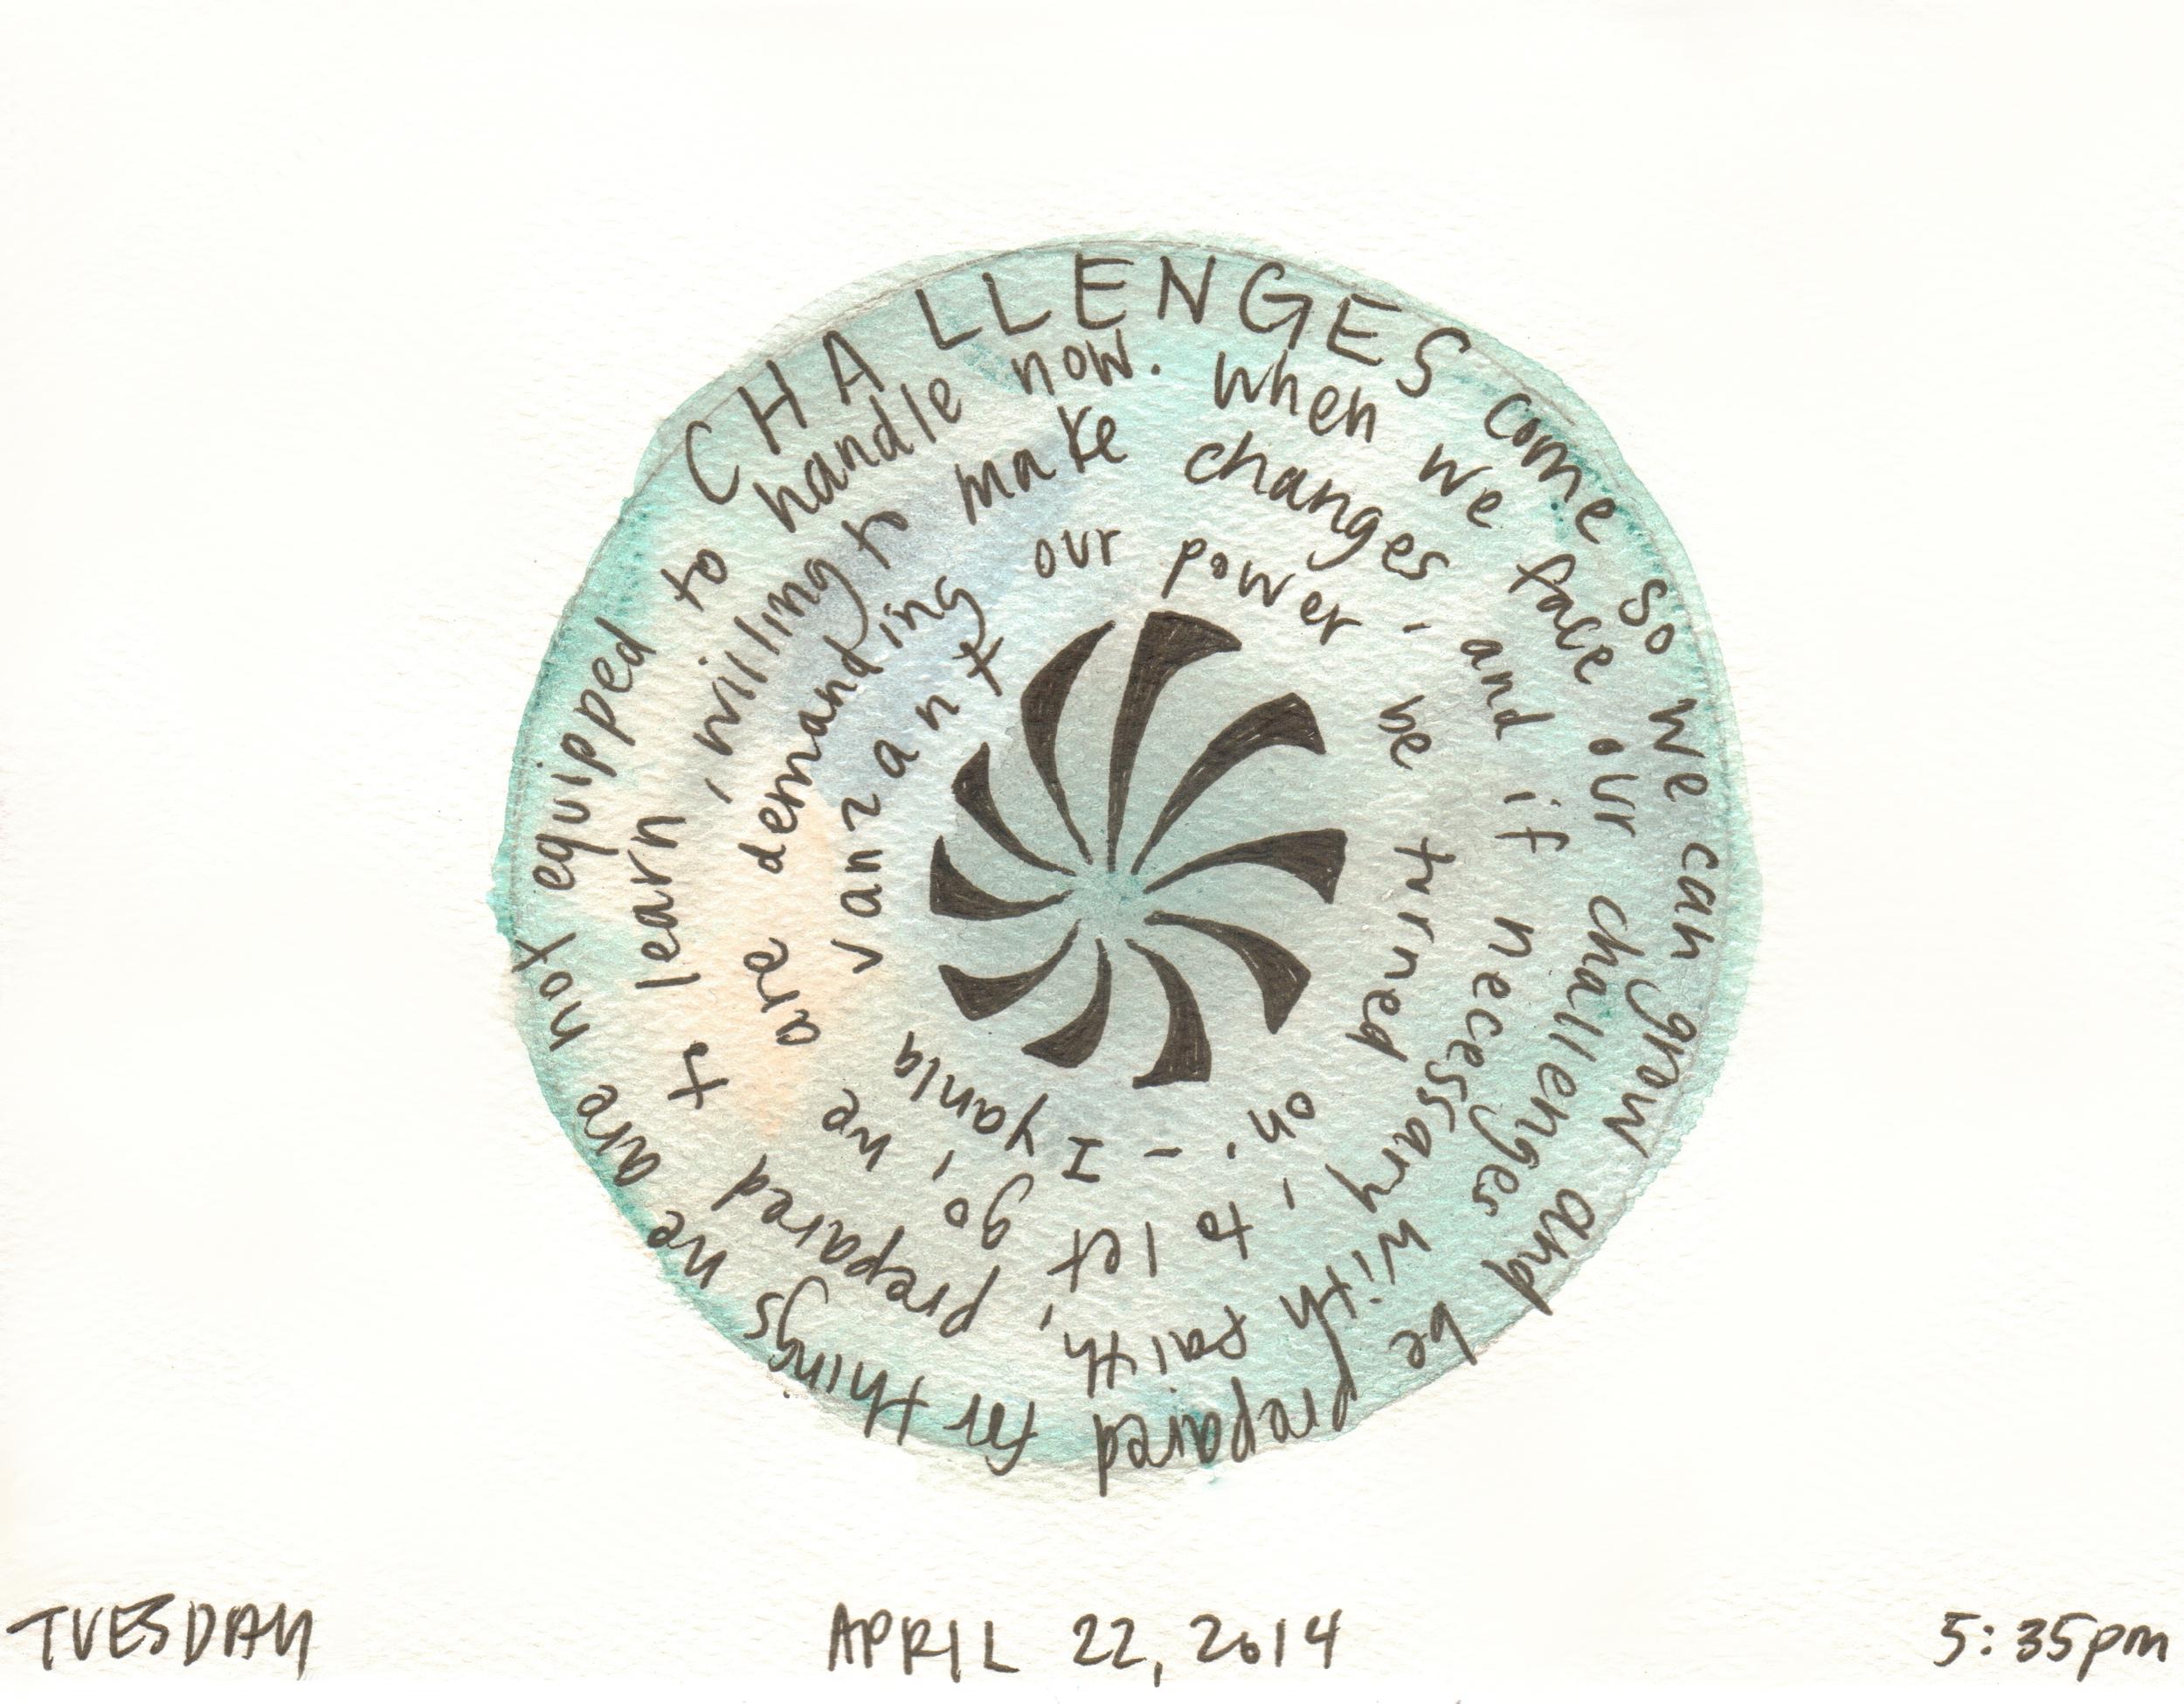 04.22.14